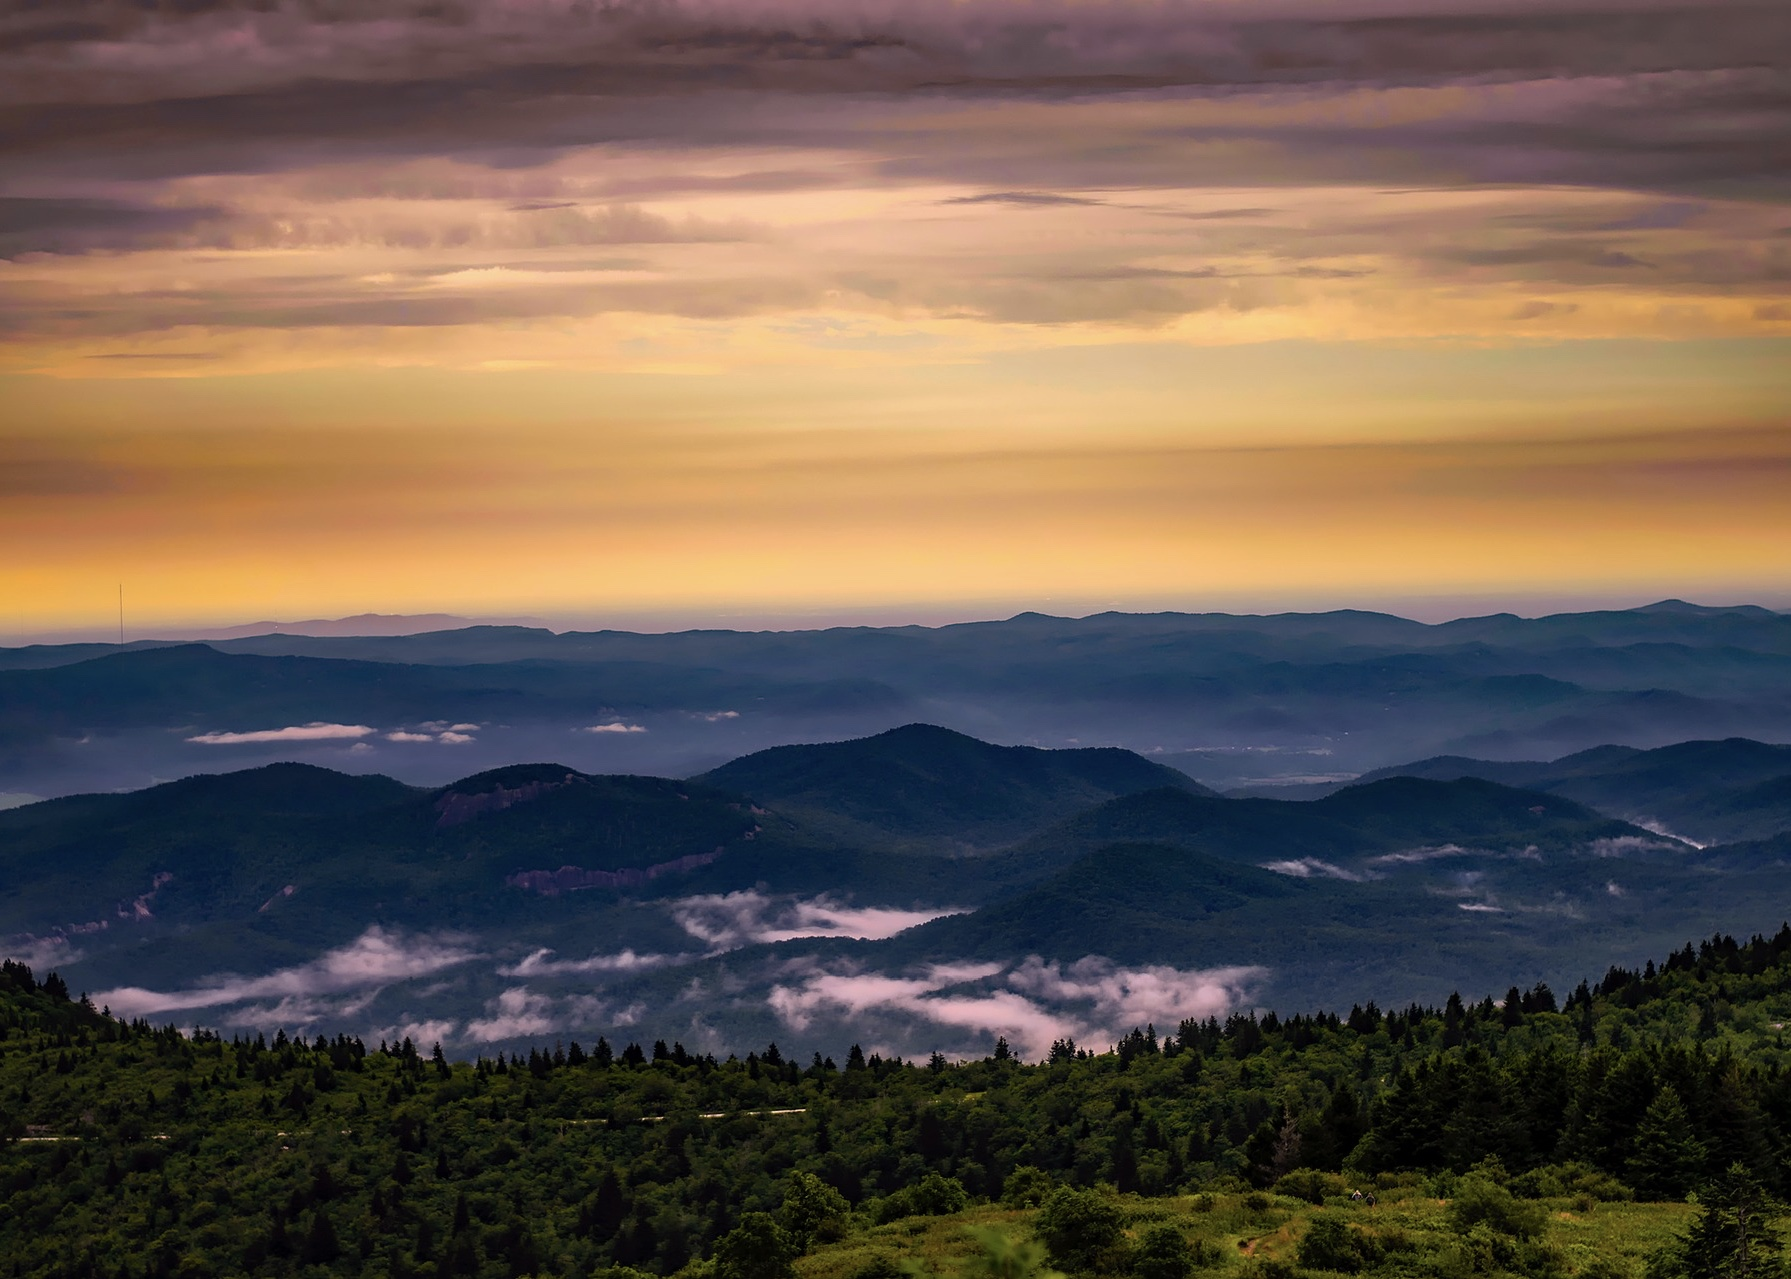 Location: Asheville -